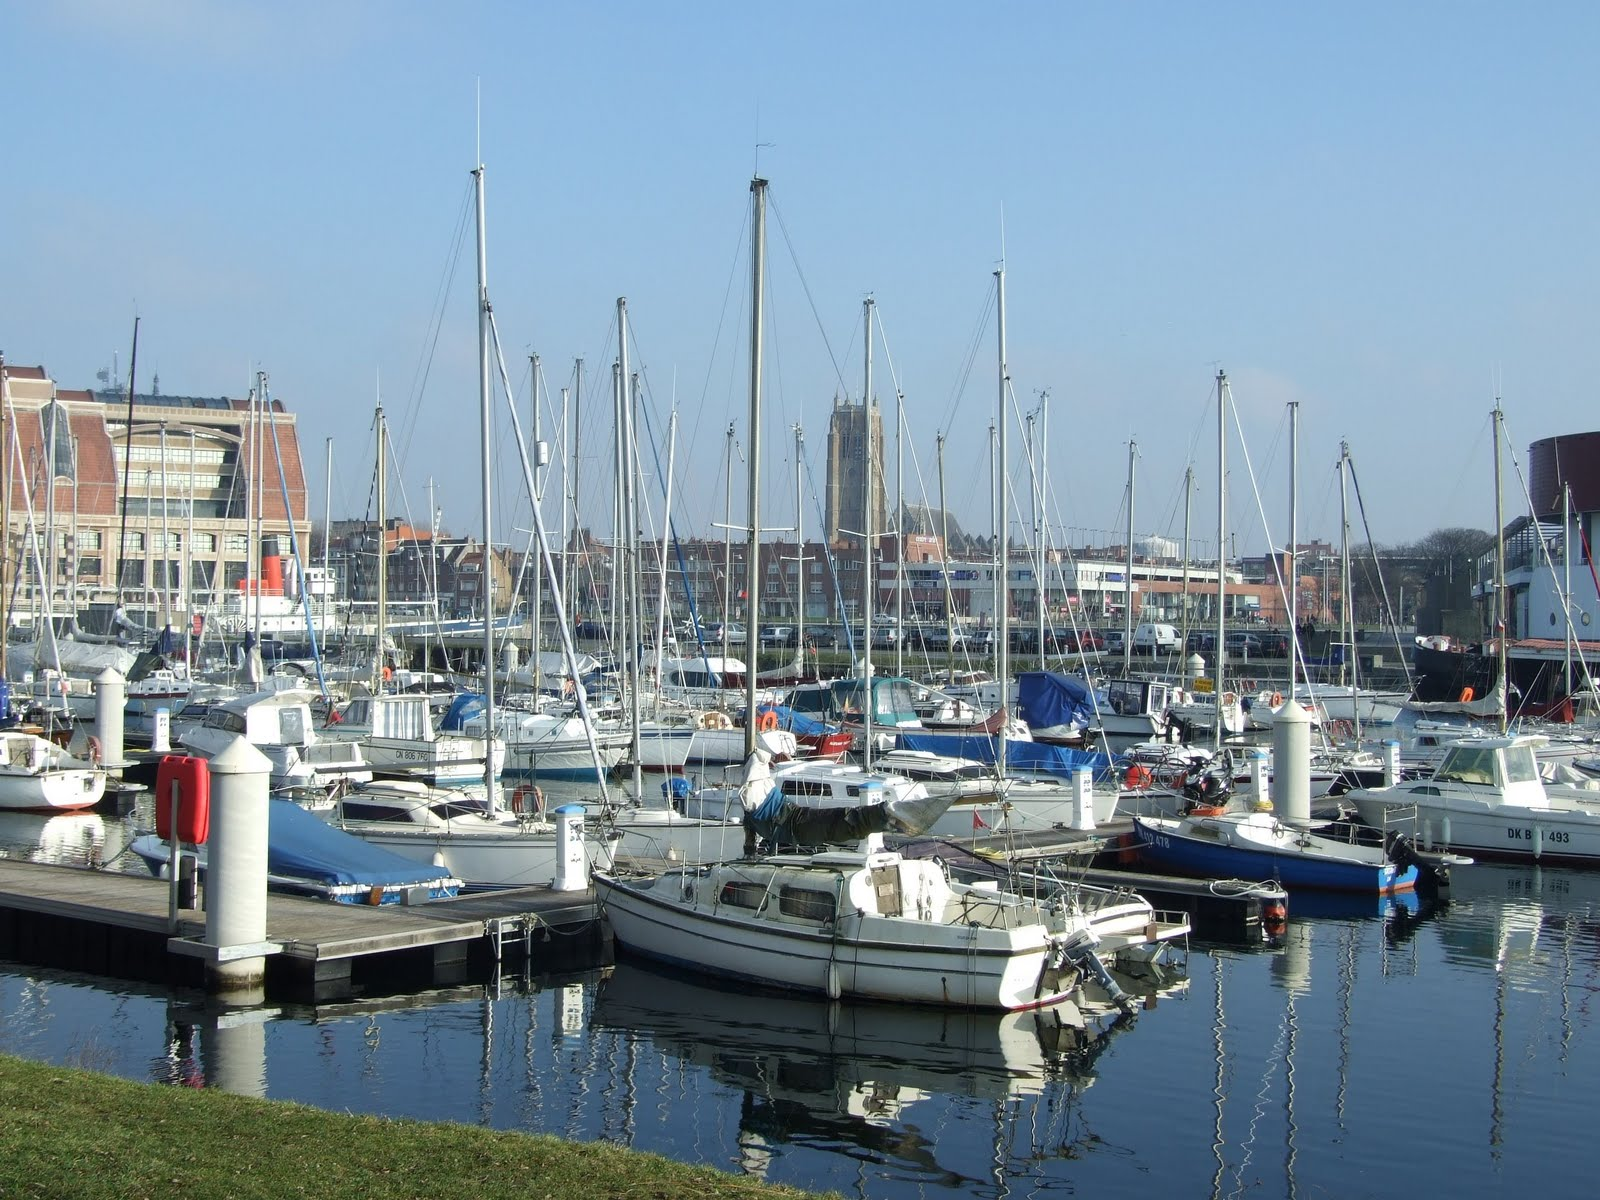 Bleuets de bruxelles dunkerque port de france - Dunkirk port france address ...